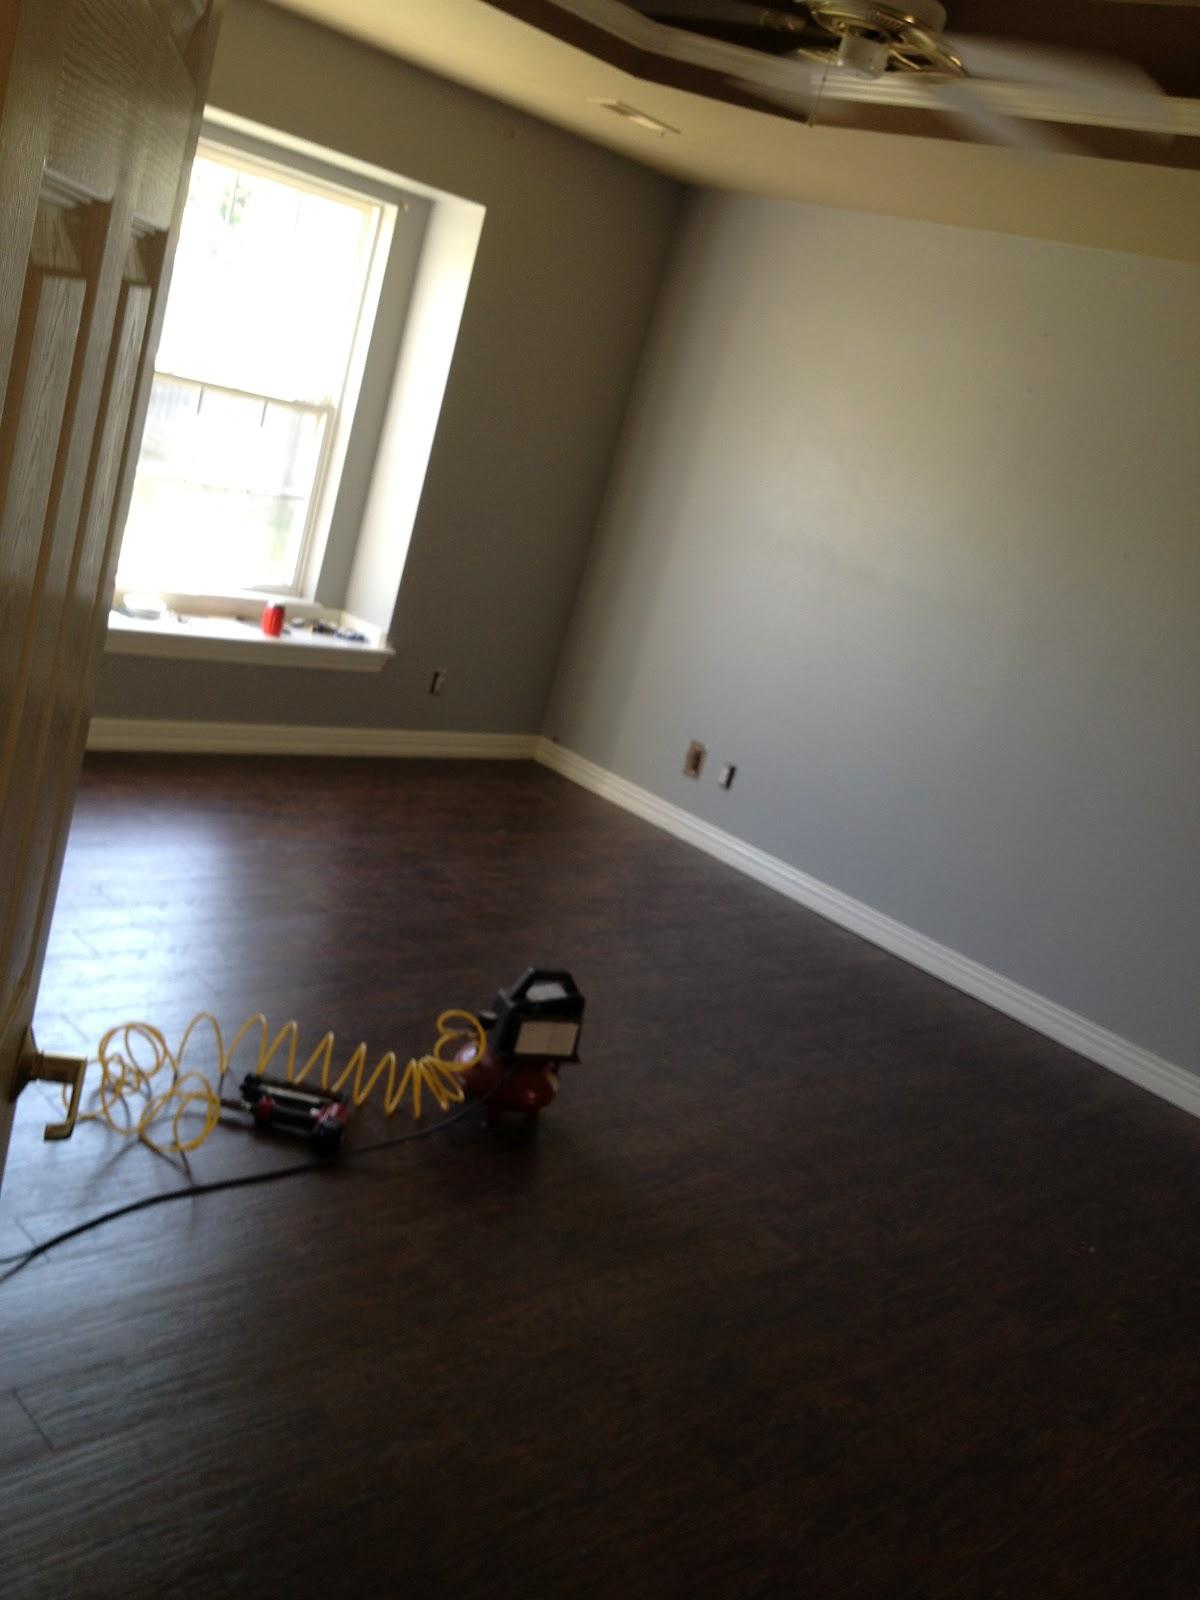 Junque 2 Jewels Master Bedroom Series Floors Paint